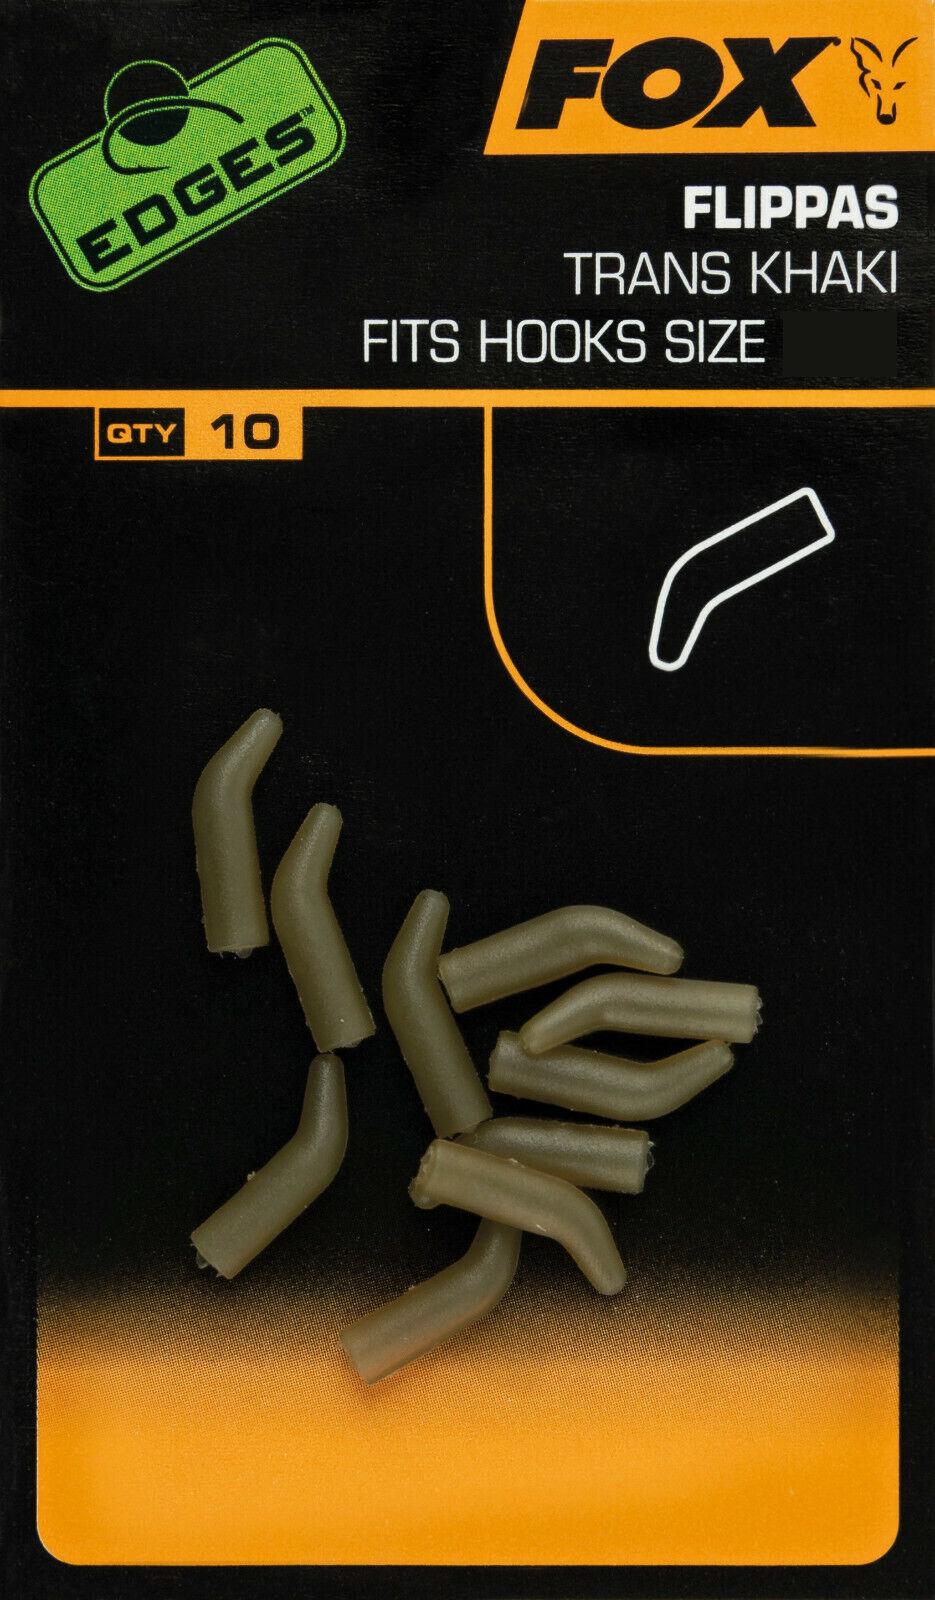 Fox Edges Short Line Alignas Trans Khaki Hook Size 6 5 4 3 2 1 Hakengröße